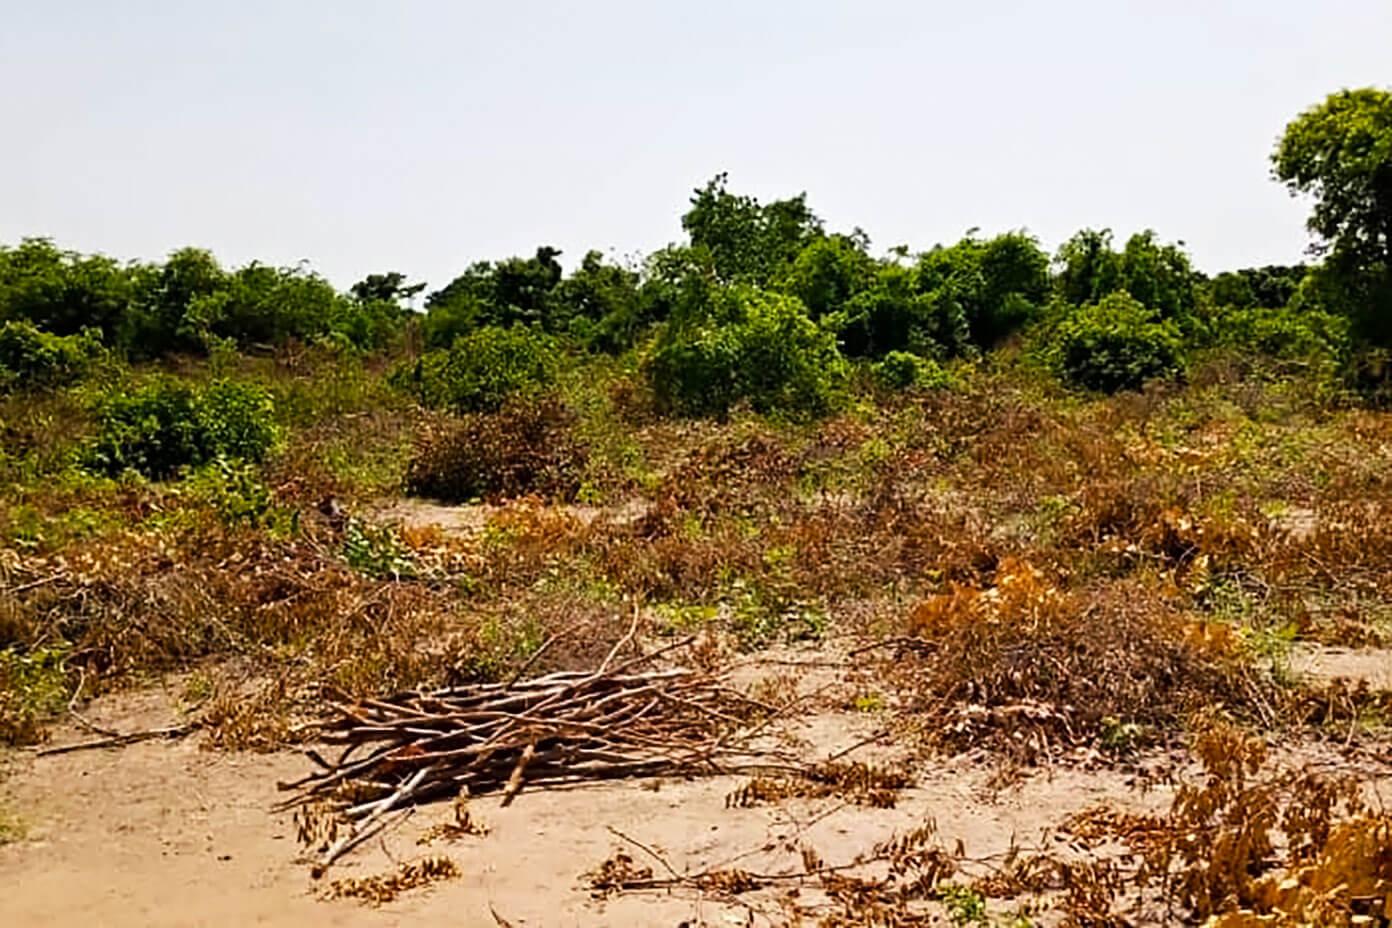 Brush land in Mali